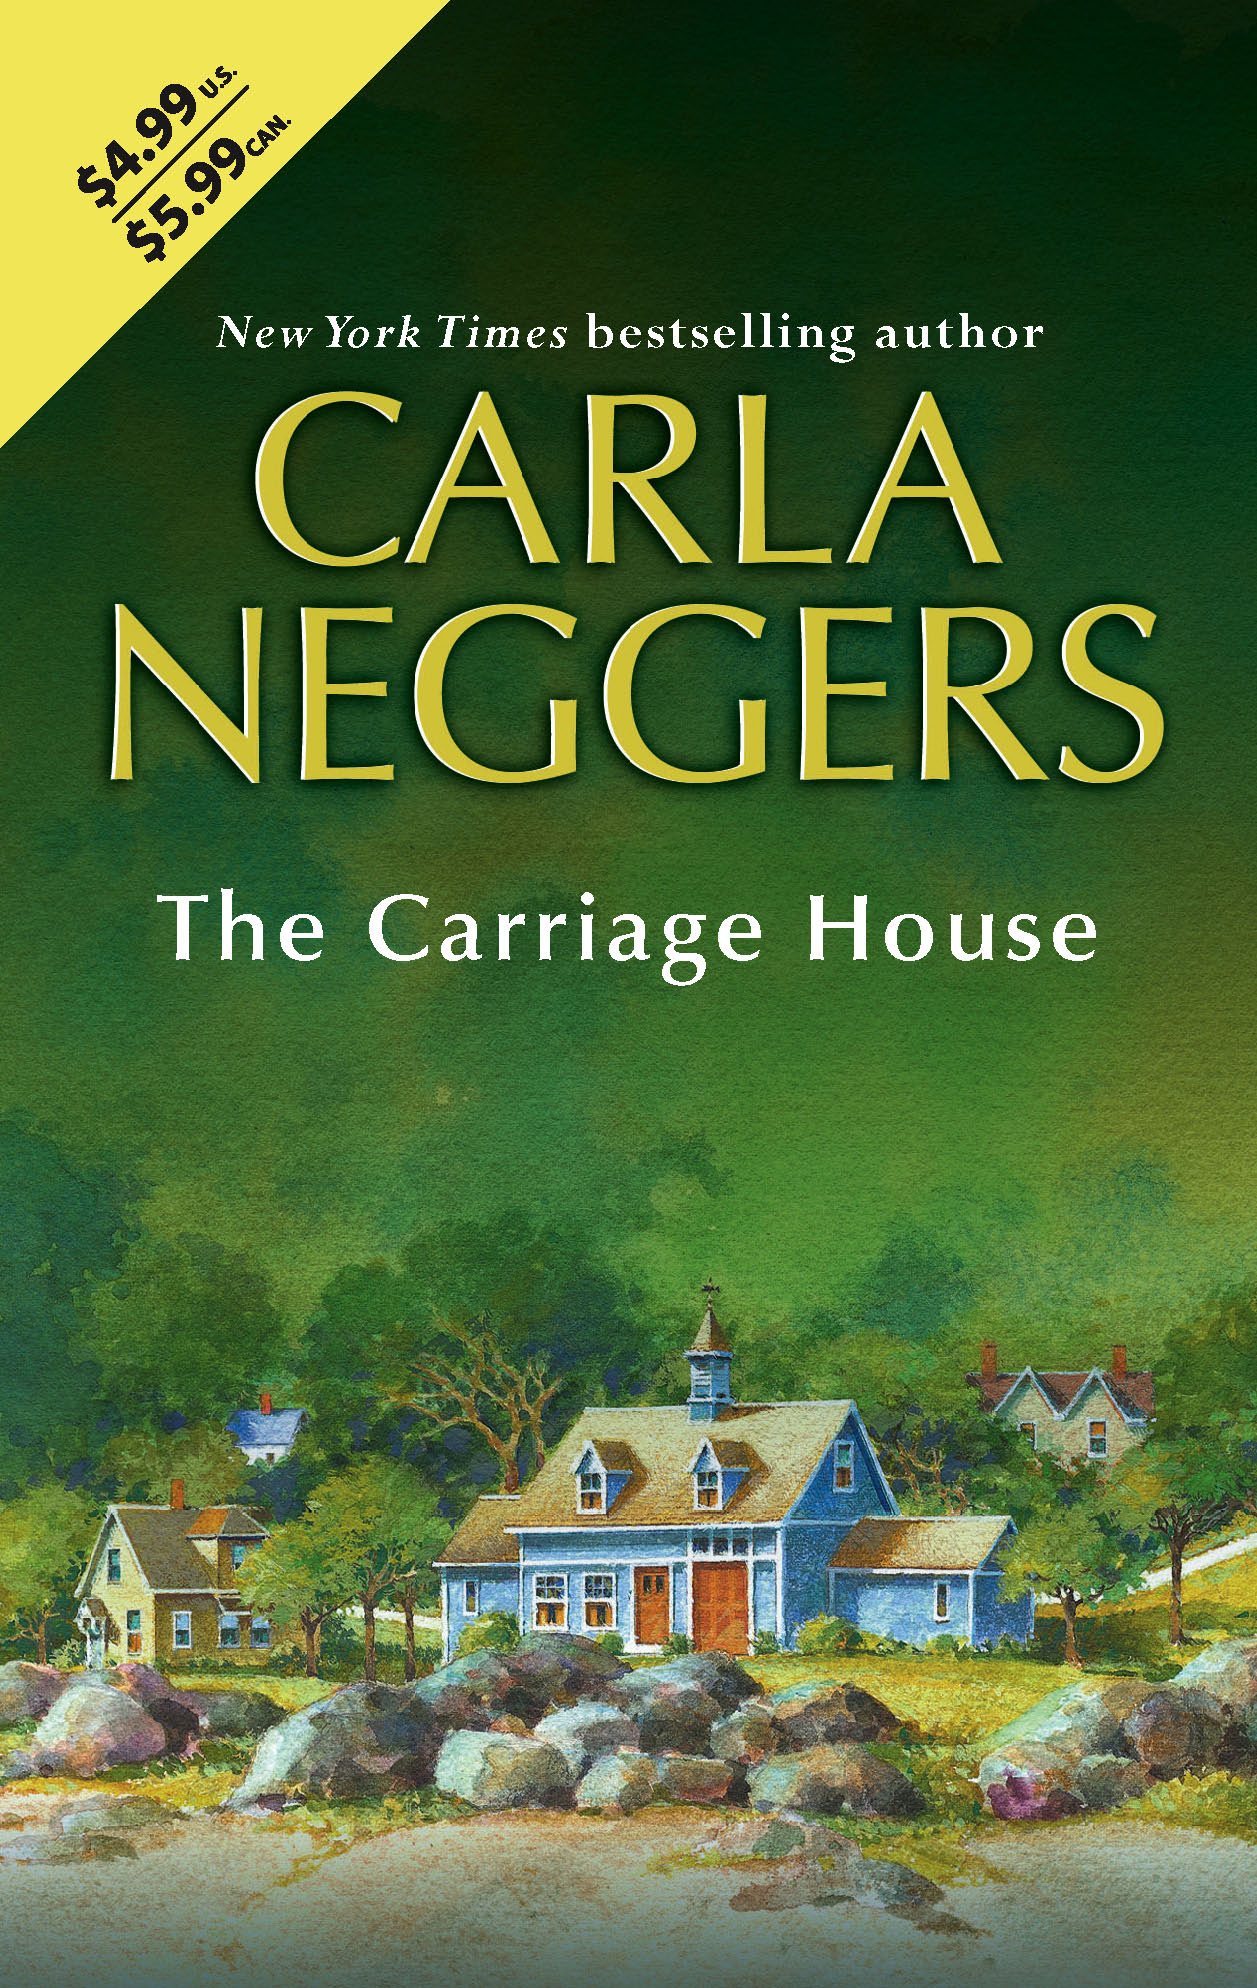 Carla Neggers The Carriage House a funssor aluminum x axis single extruder carriage rj4jp 01 08 8uu y carriage kit for replicator ctc flashforge upgrade